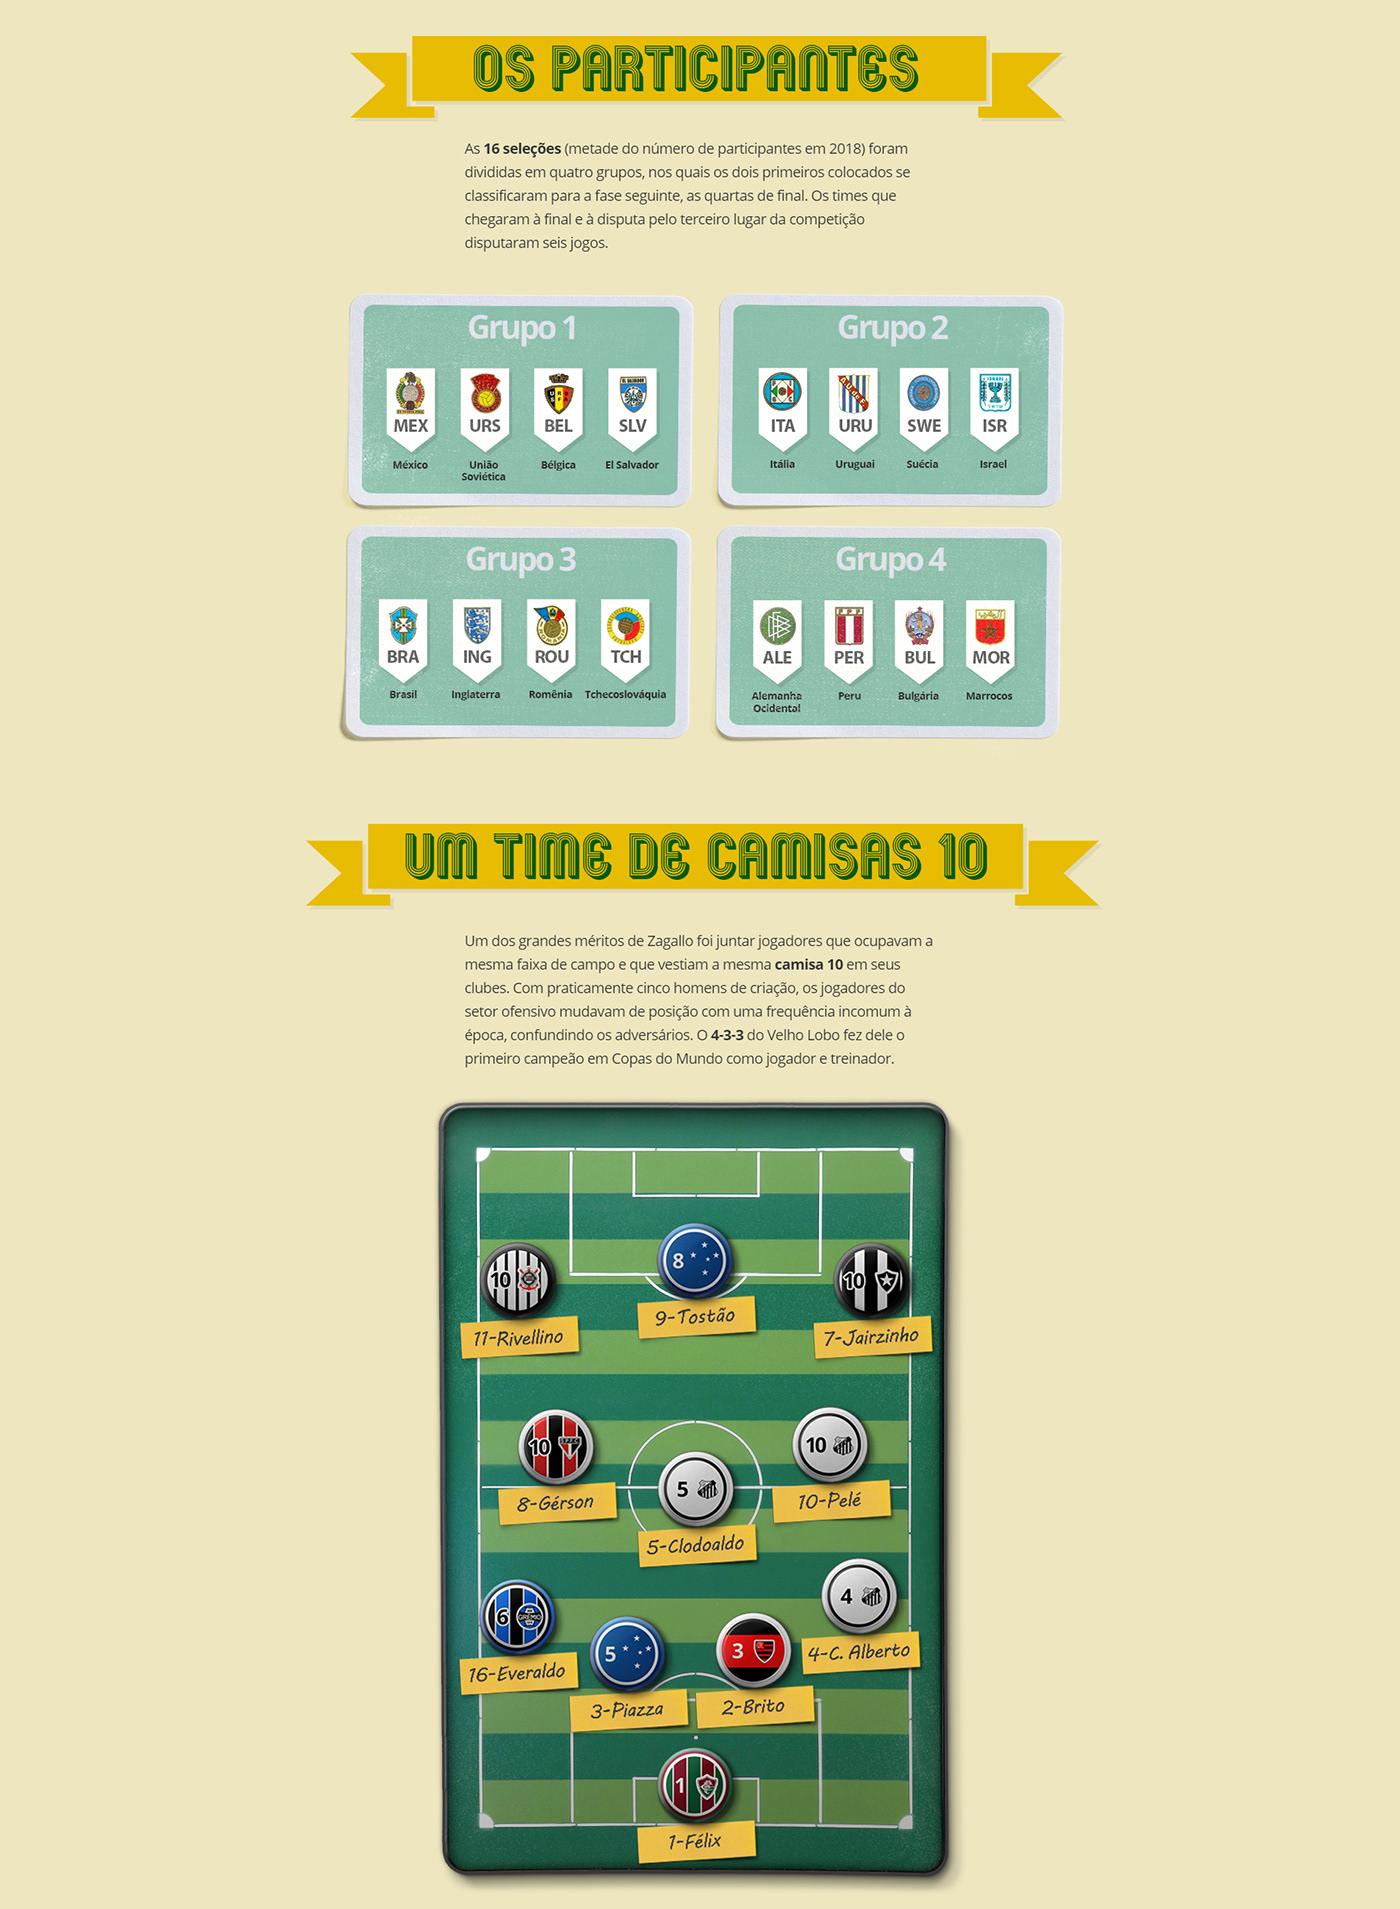 Brasil Esporte futebol globoesporte infigrafico pele